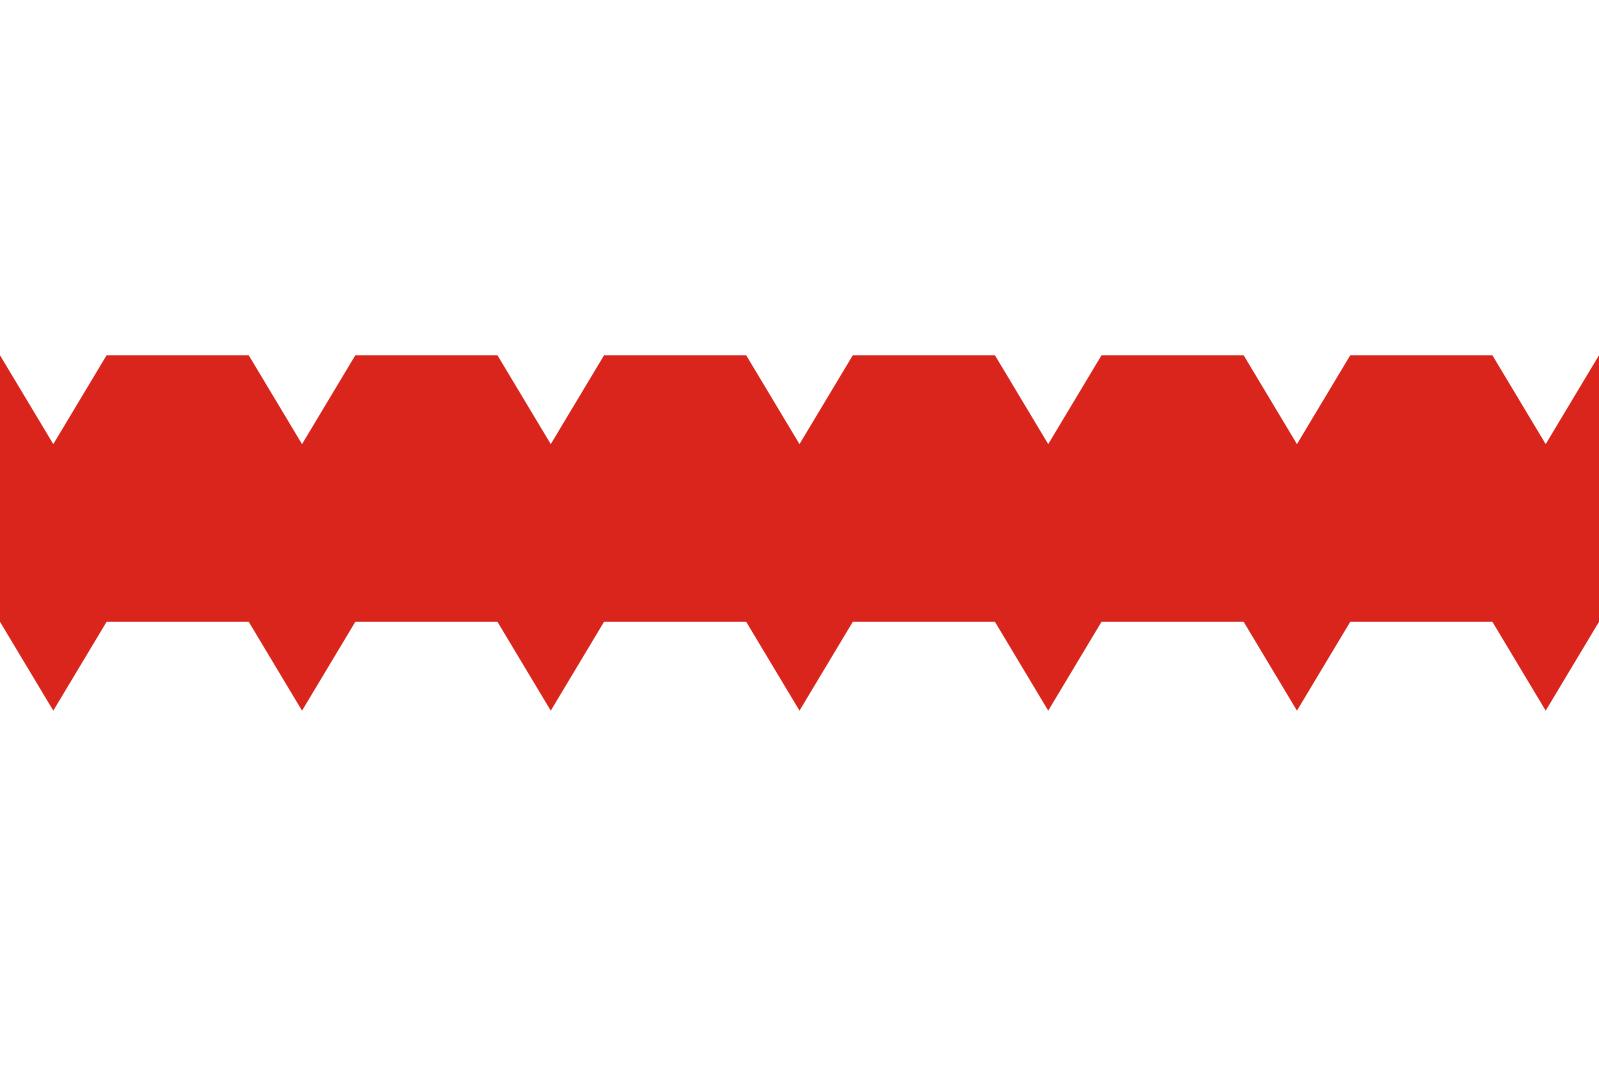 OMSK ✖️ Омск  TIX ➡️ http://t.co/M5Fp3ENr98 VIP ➡️ http://t.co/SFuU6sO9uy   #MarsInRussia #LoveLustTour http://t.co/1SANyCnxtc